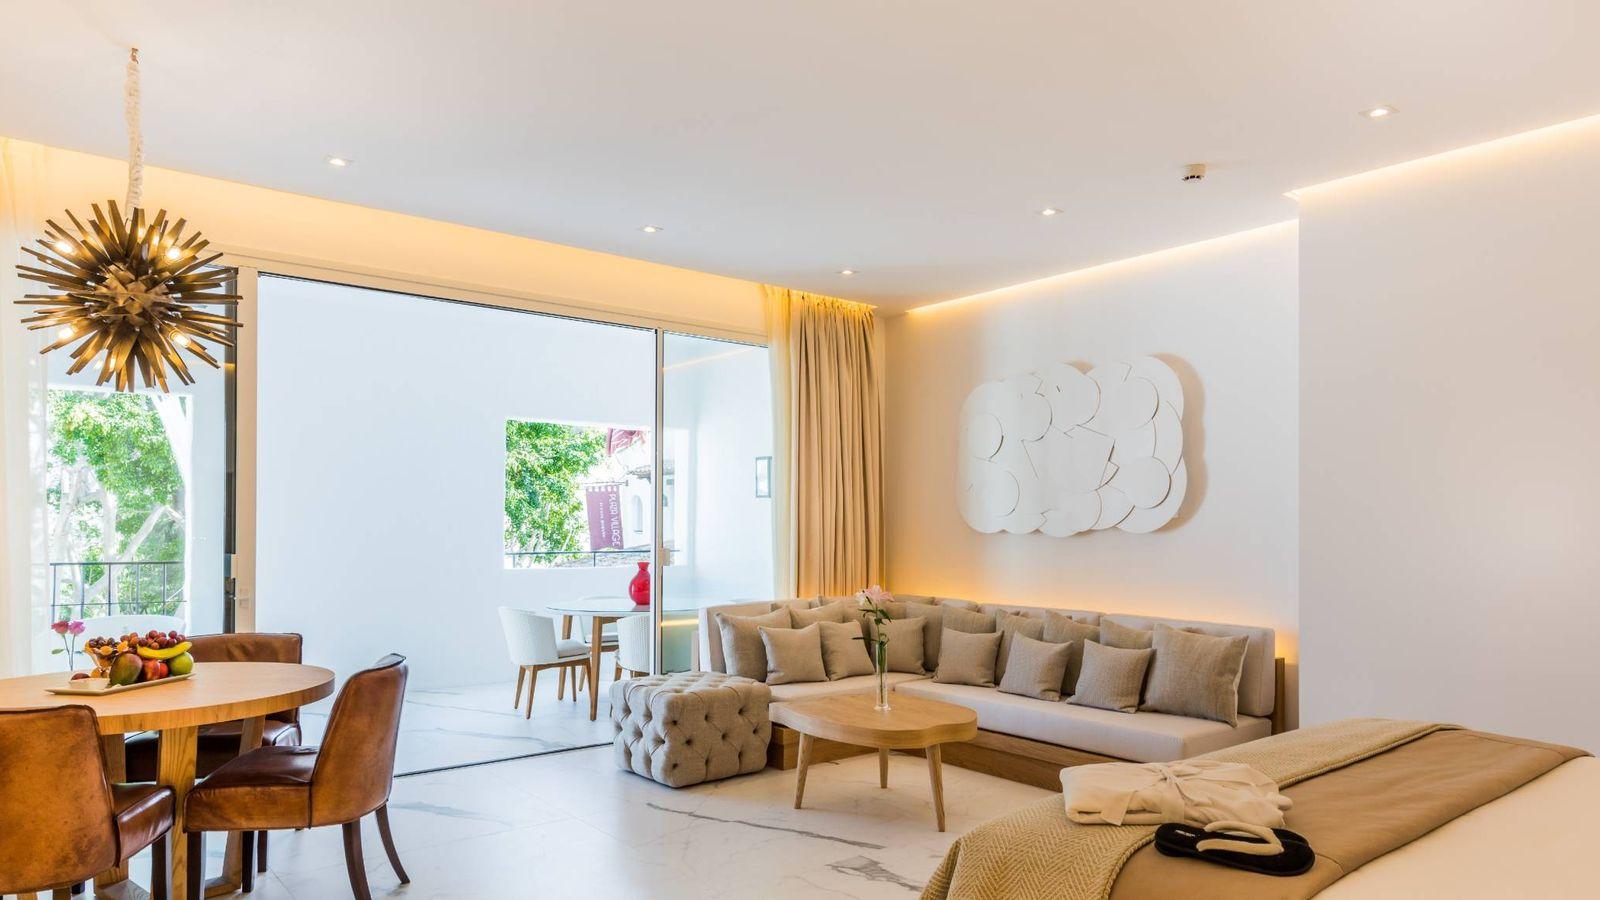 Foto: Imagen de la Suite Junior del Nobu Hotel Marbella de Robert de Niro.